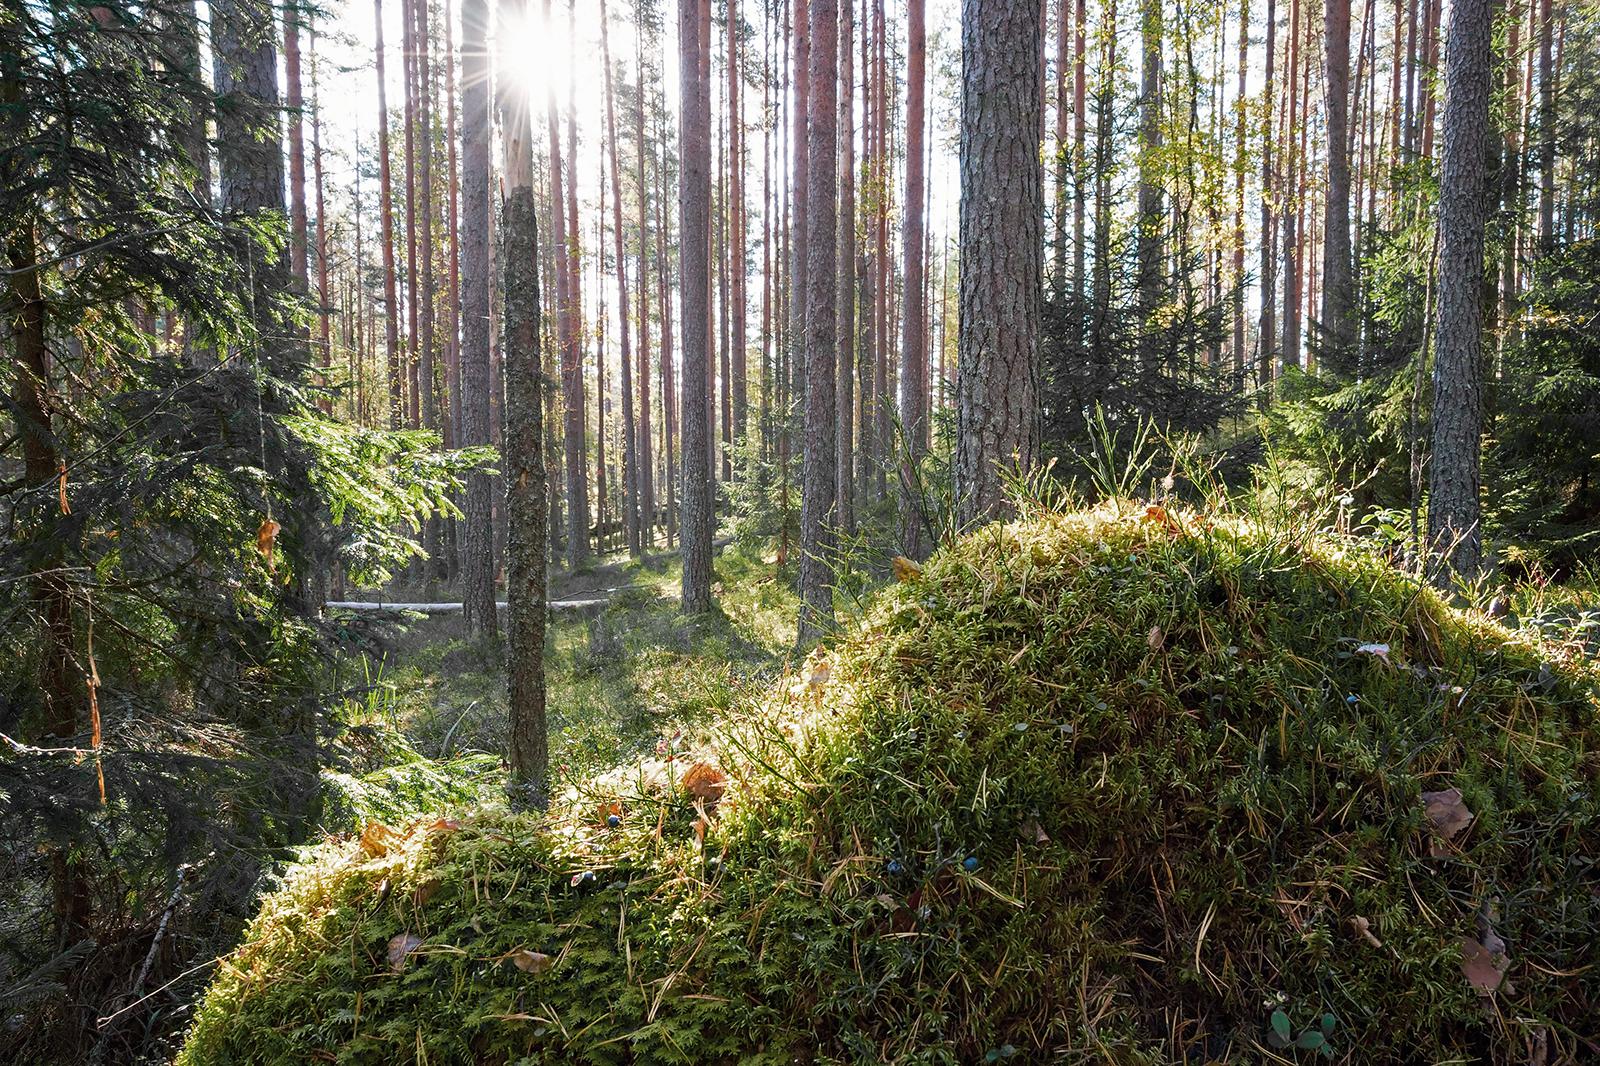 Forest. Photo: Shutterstock